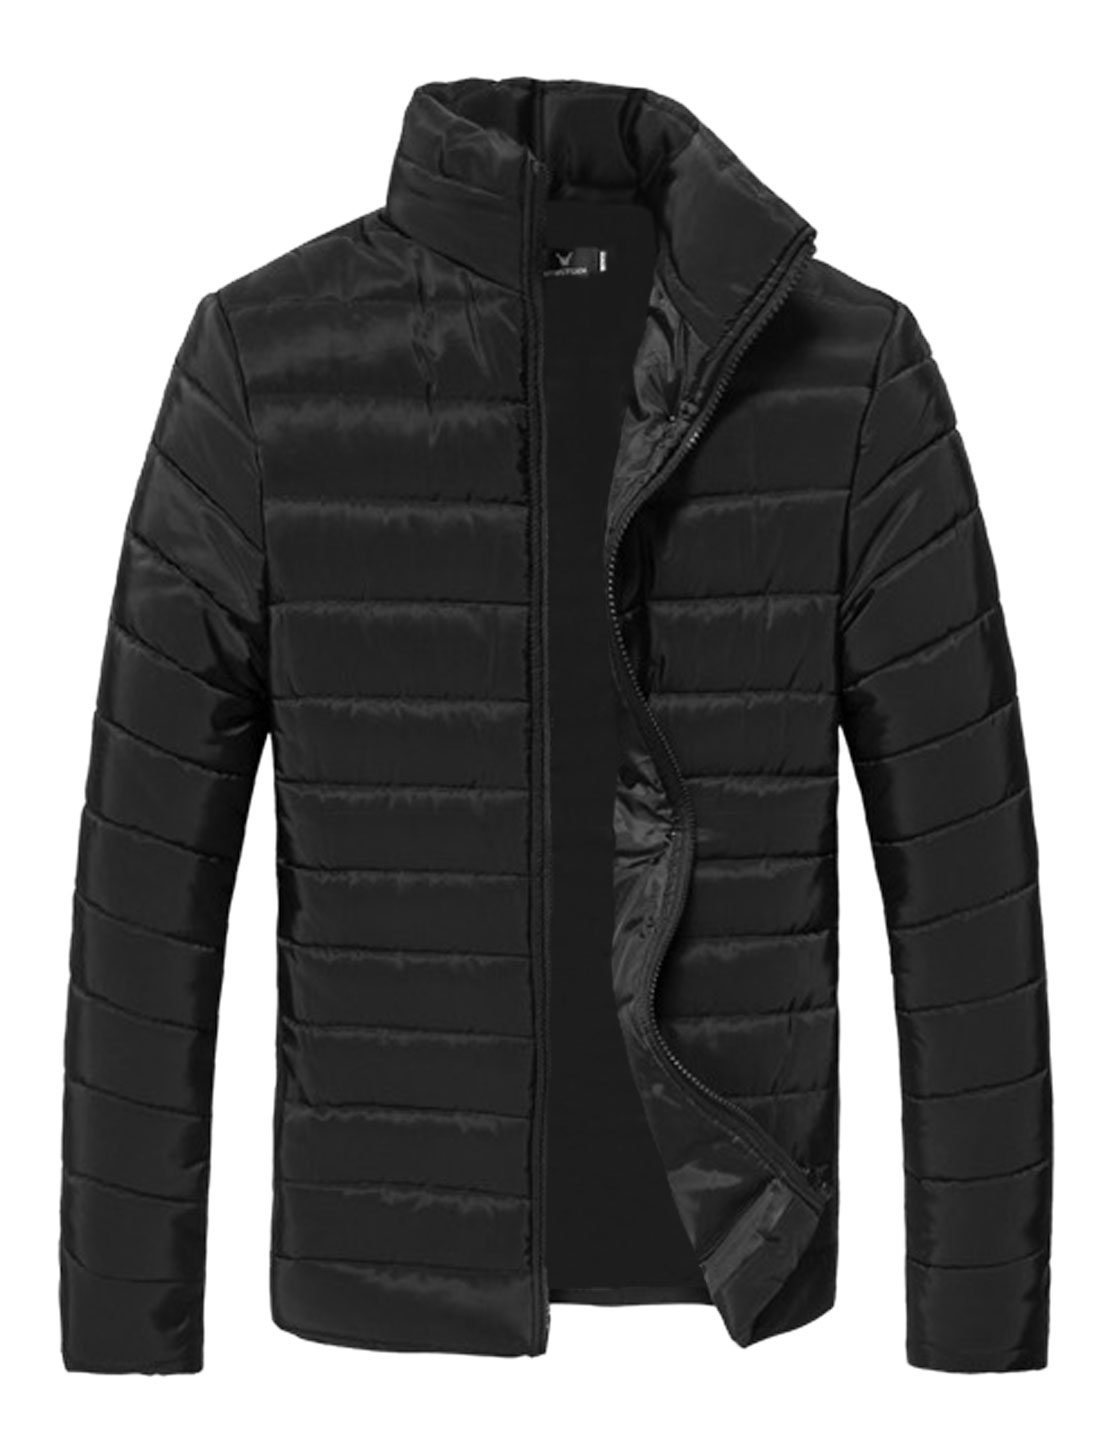 Men Black Zip Up Zipper Pockets Slim Fit Leisure Padded Coat S